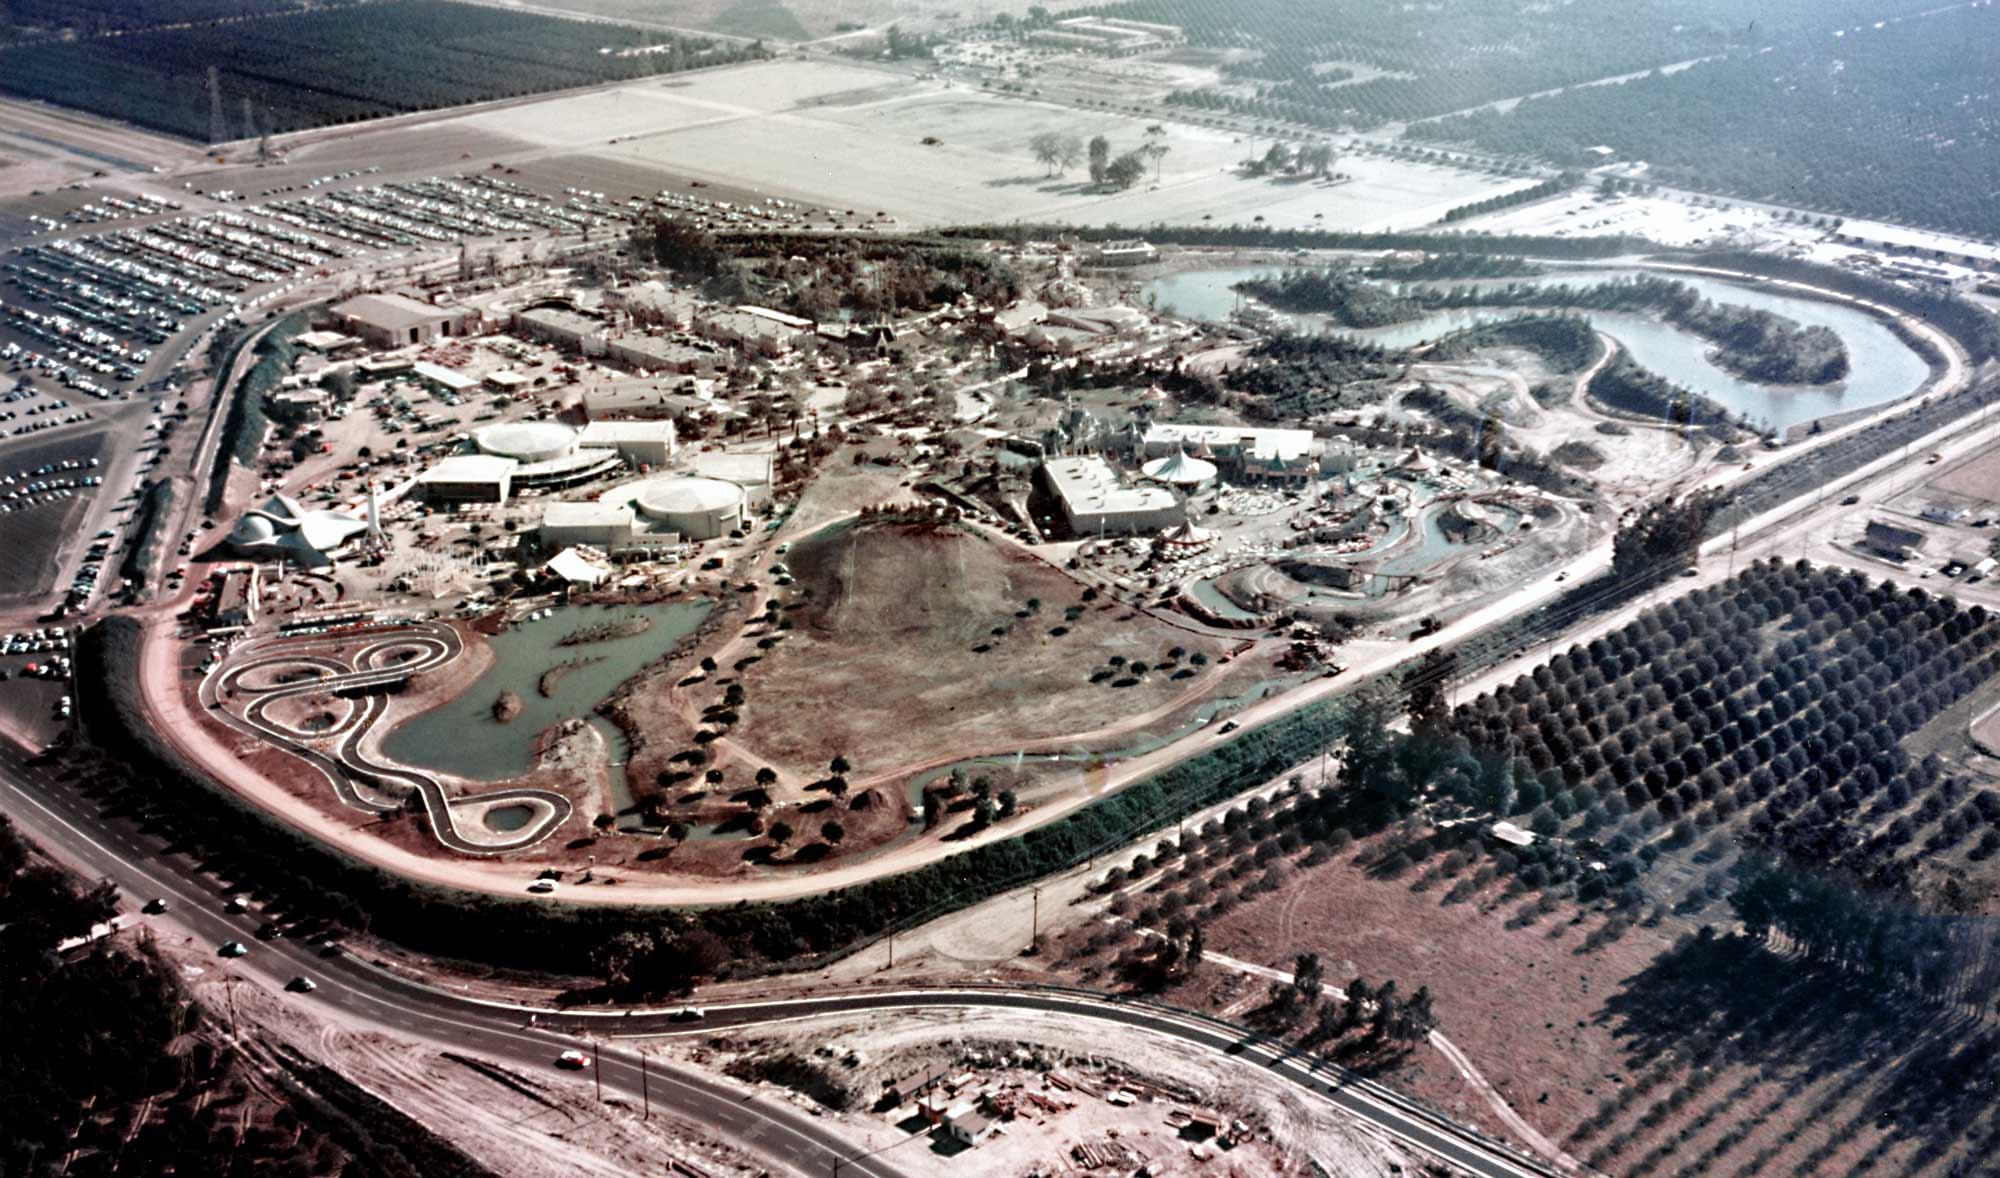 Early Disneyland